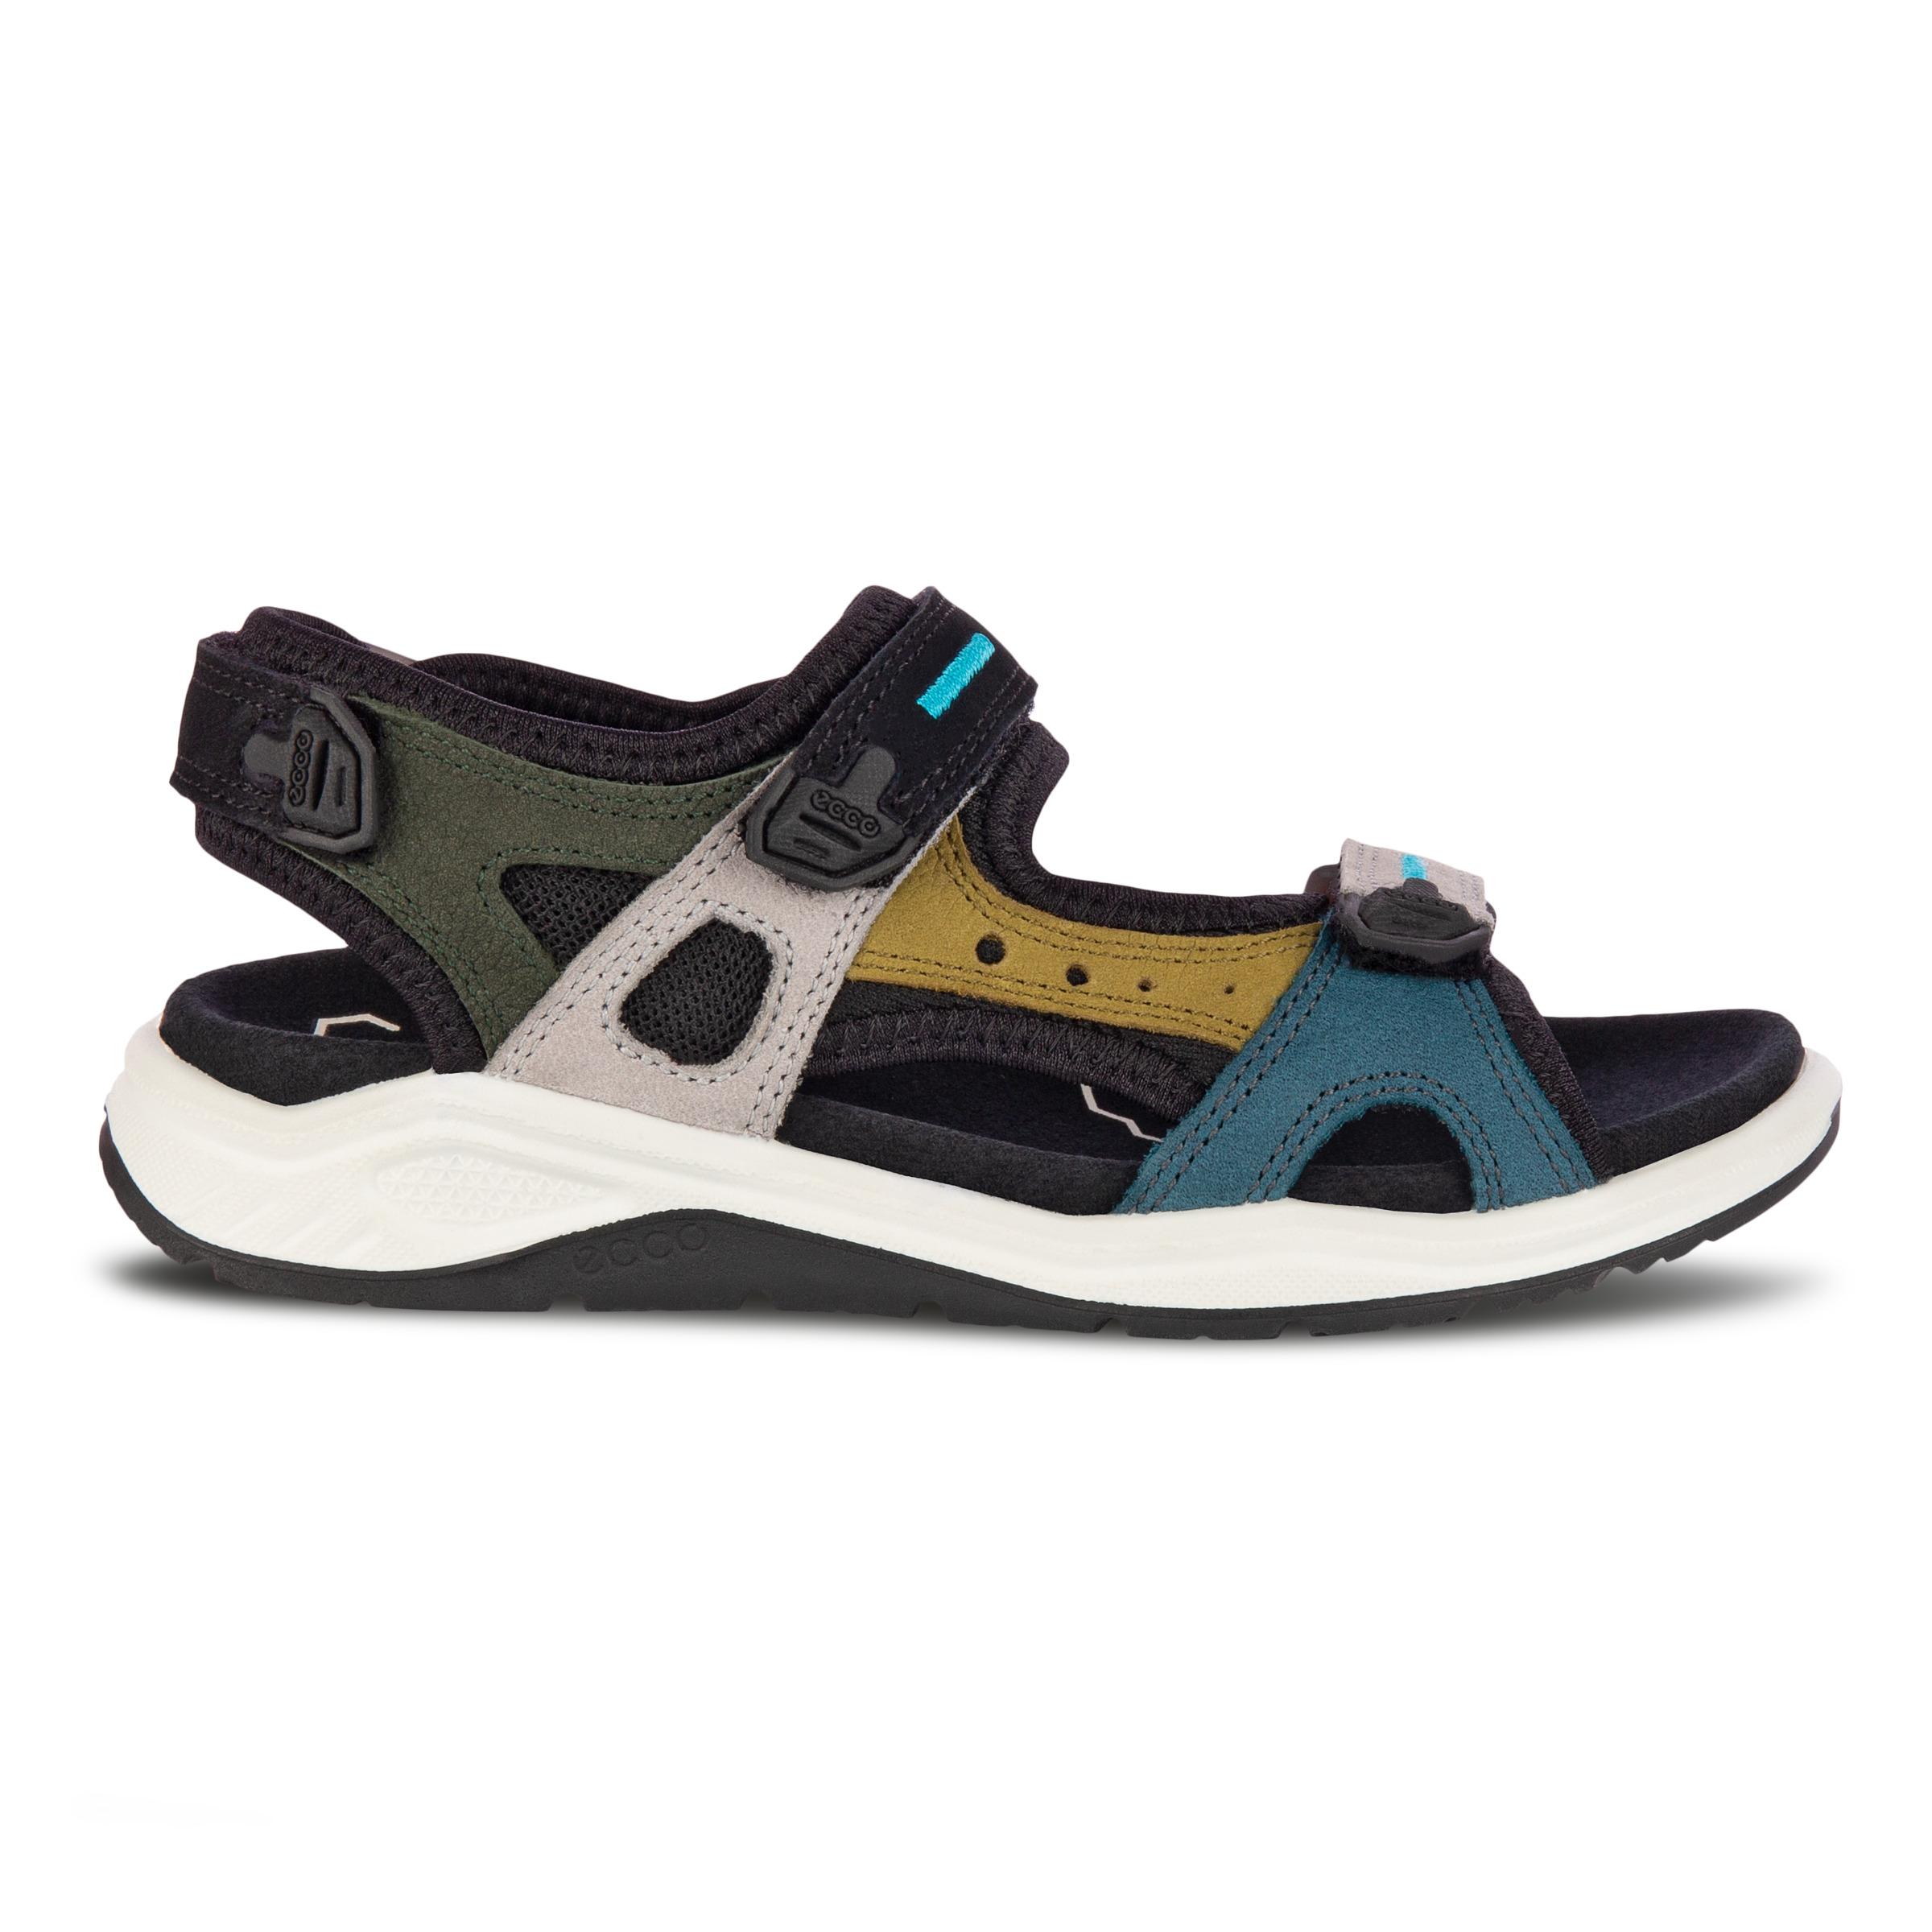 Ecco 710643 sandal, multi, 36